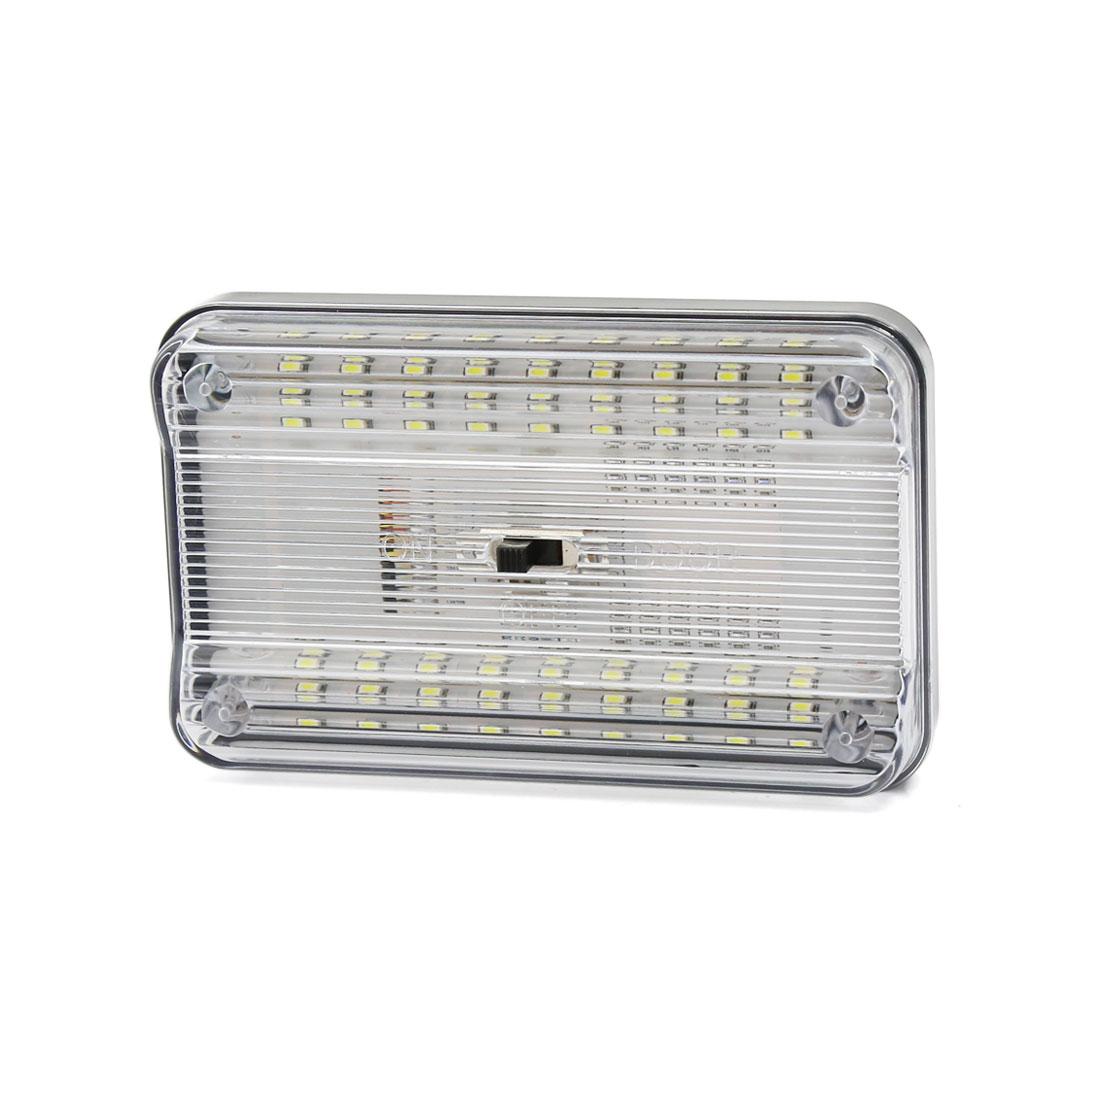 Car Vehicle 36 LED Roof Dome Ceiling Interior Light Lamp Bulb DC 12V White